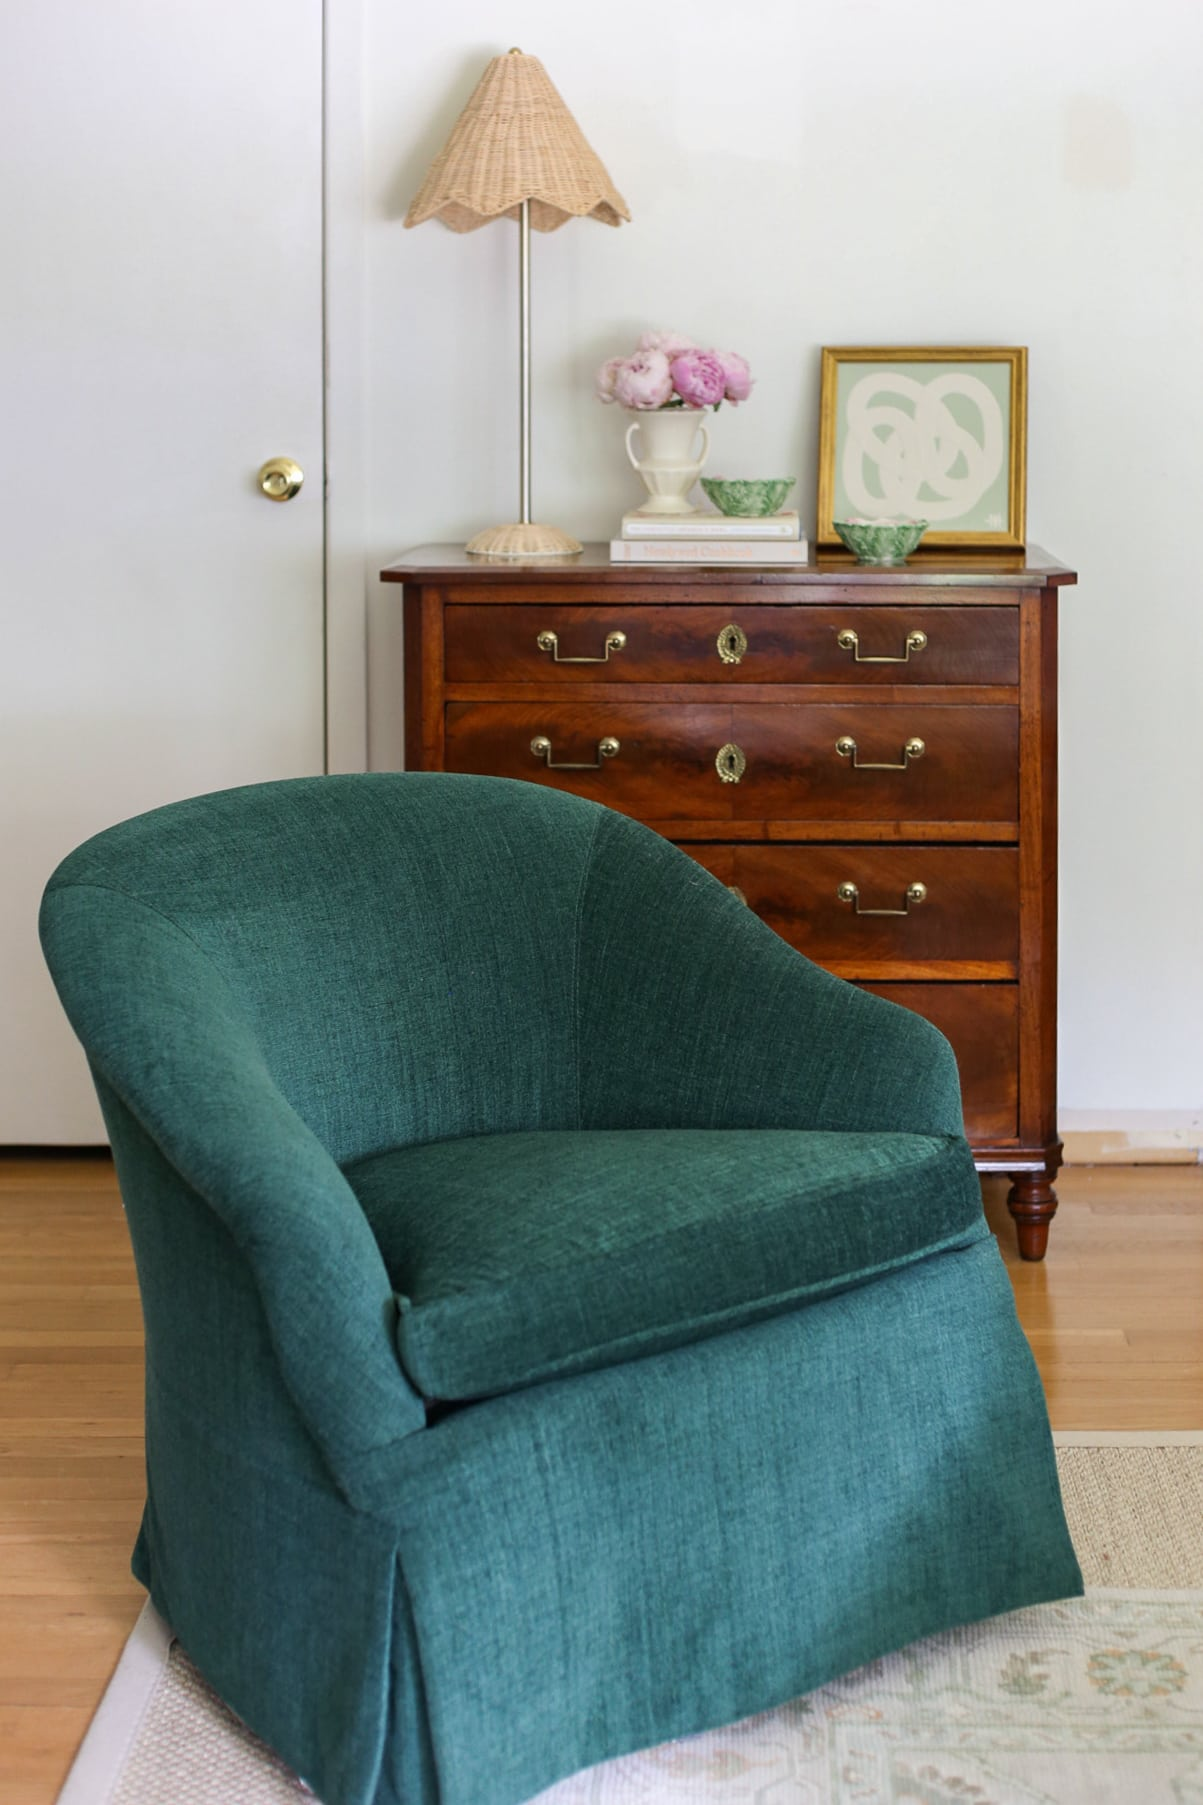 living-room-green-chairs-kravet-fabric